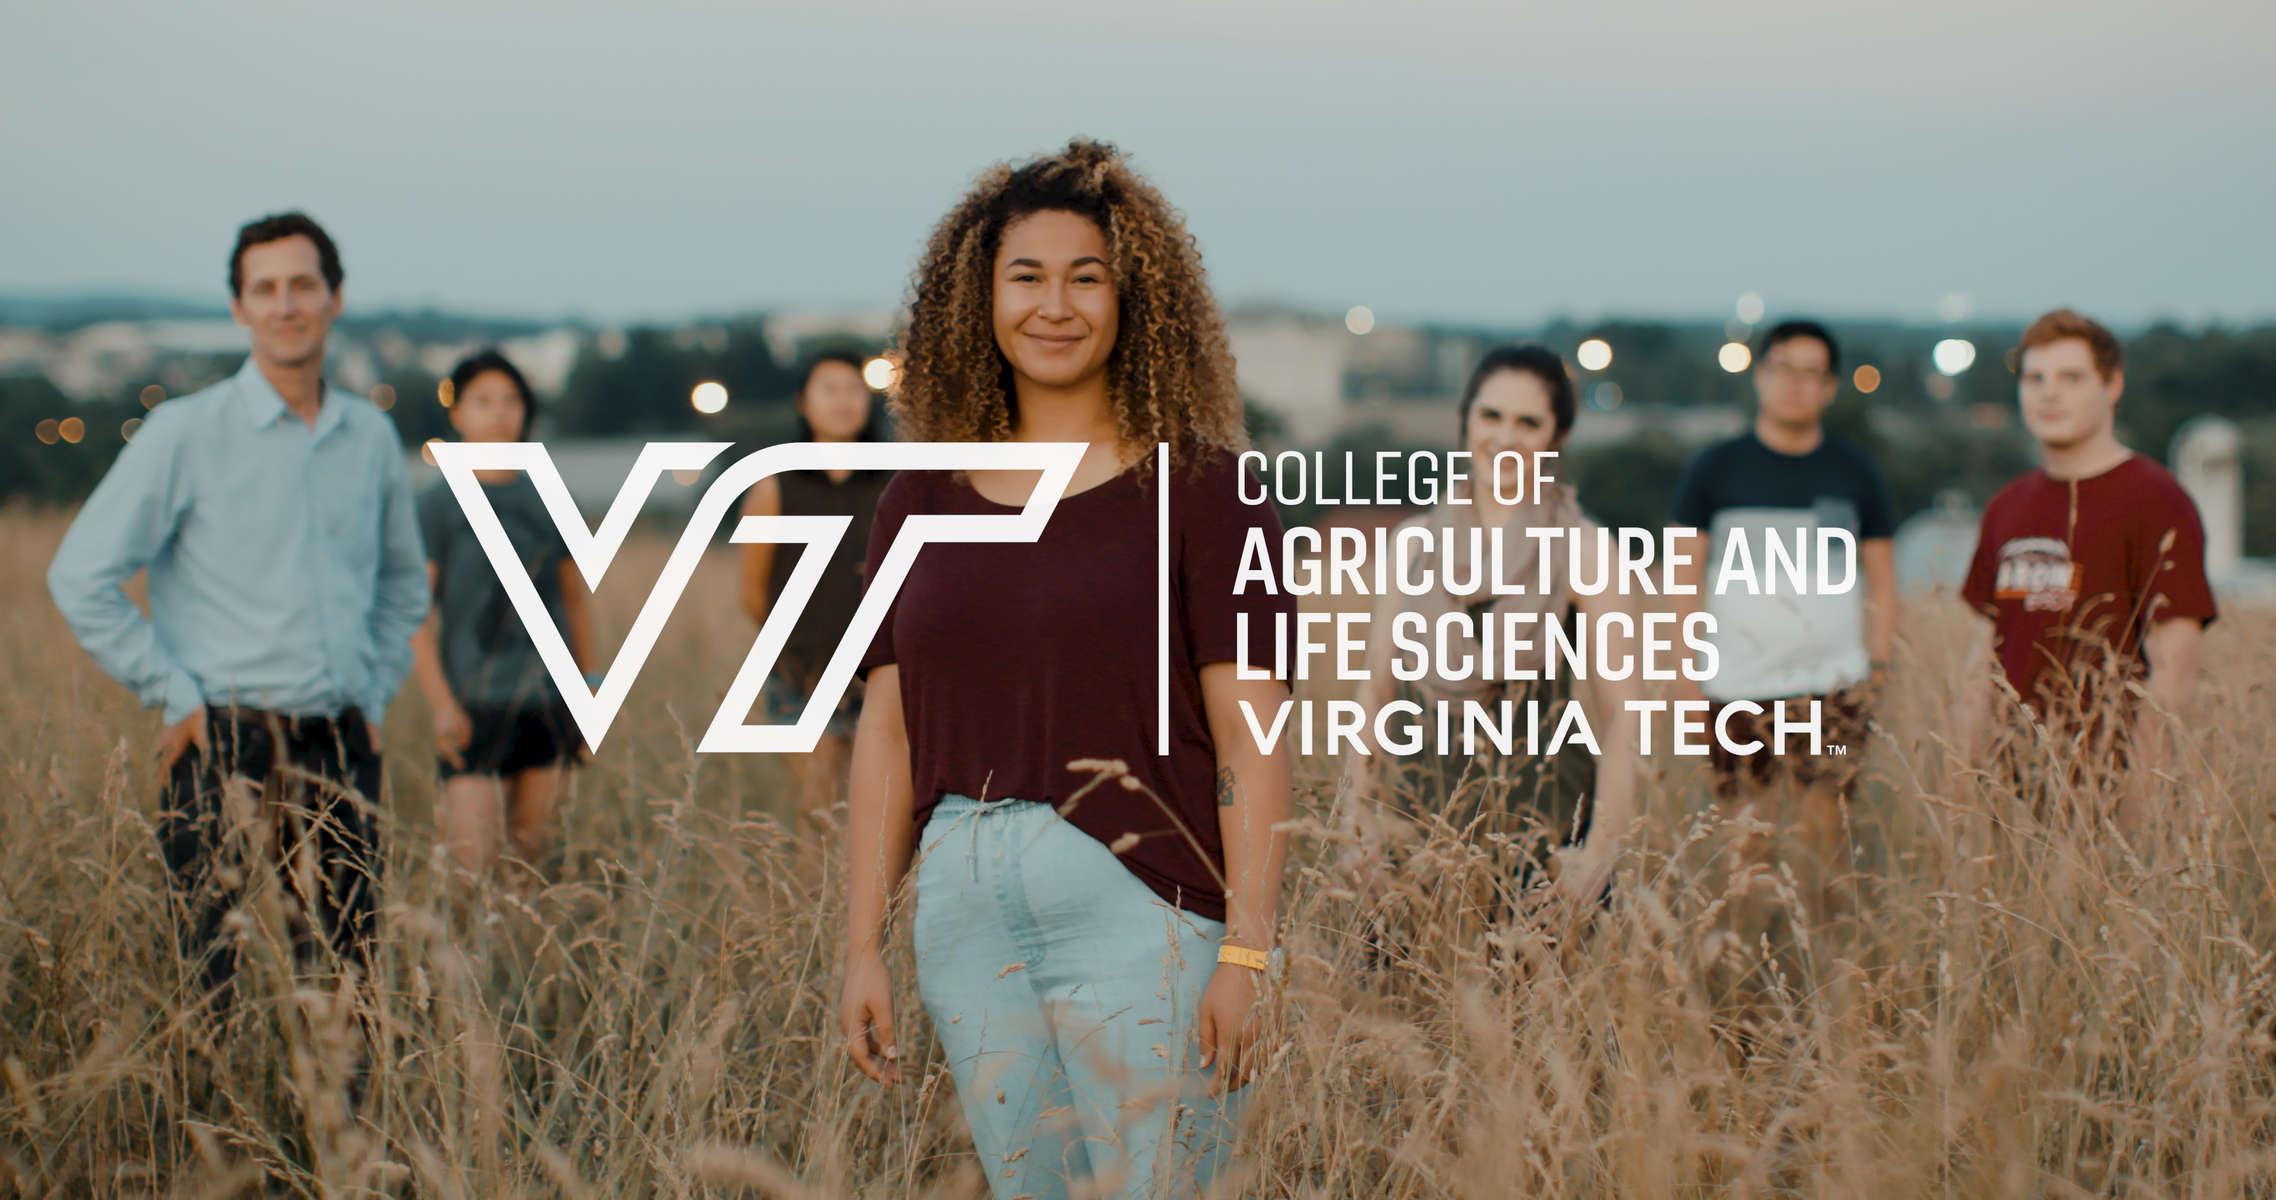 sam-dean-higher-education-director-virginia-tech